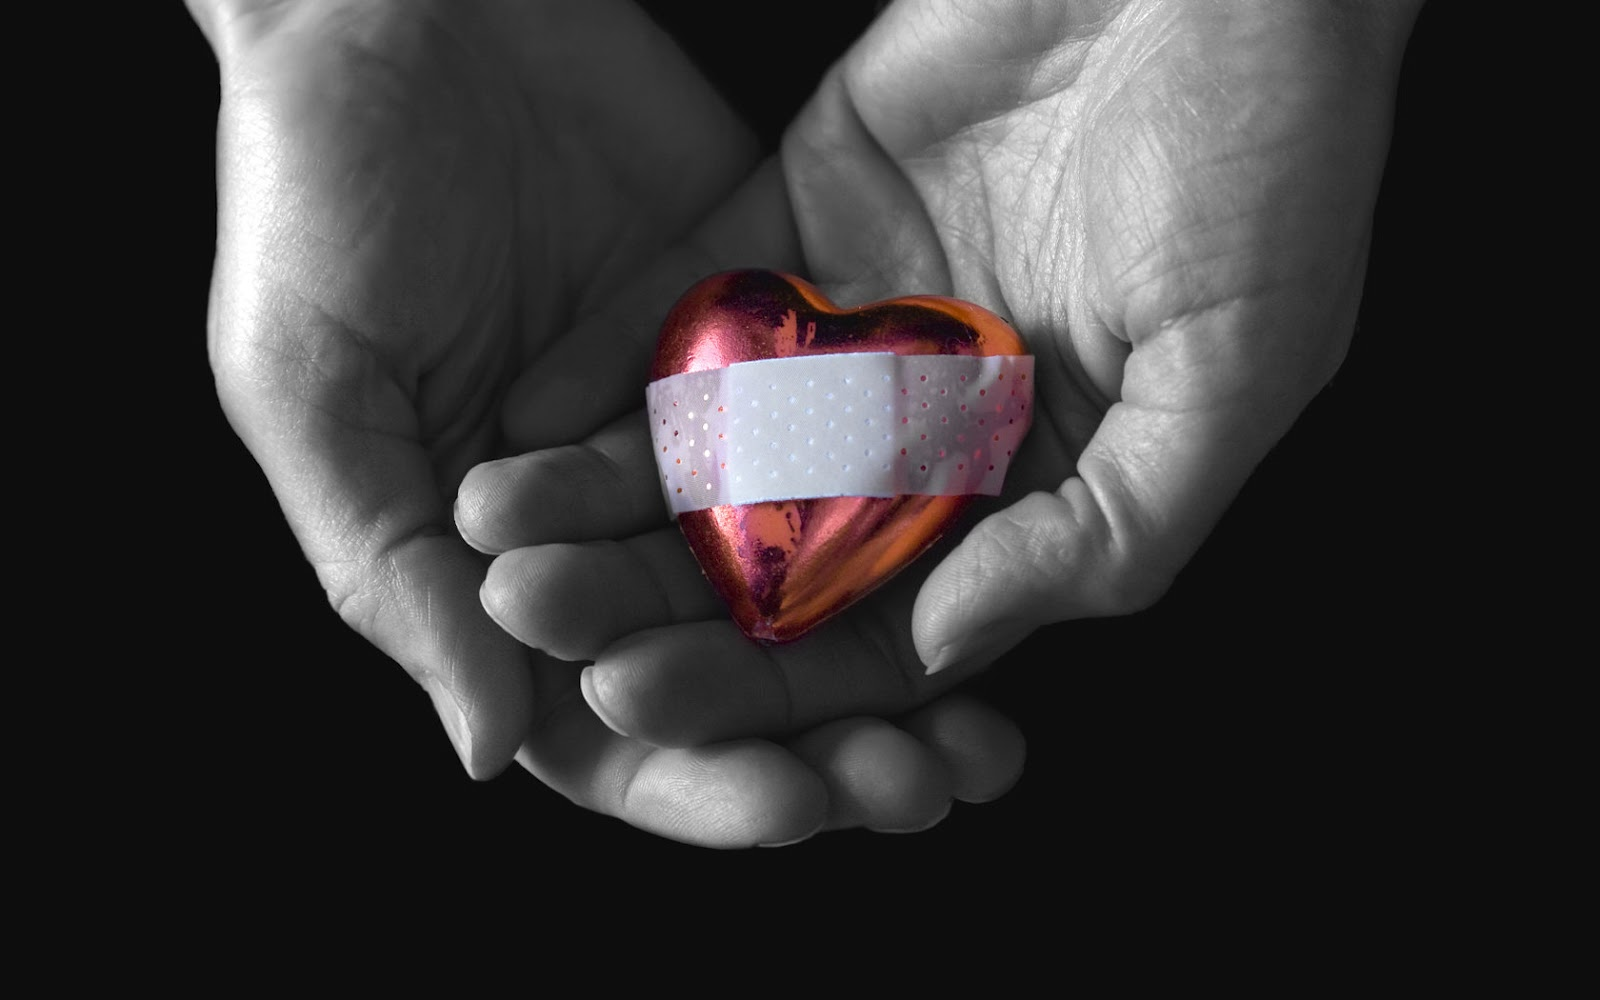 corazon con curita